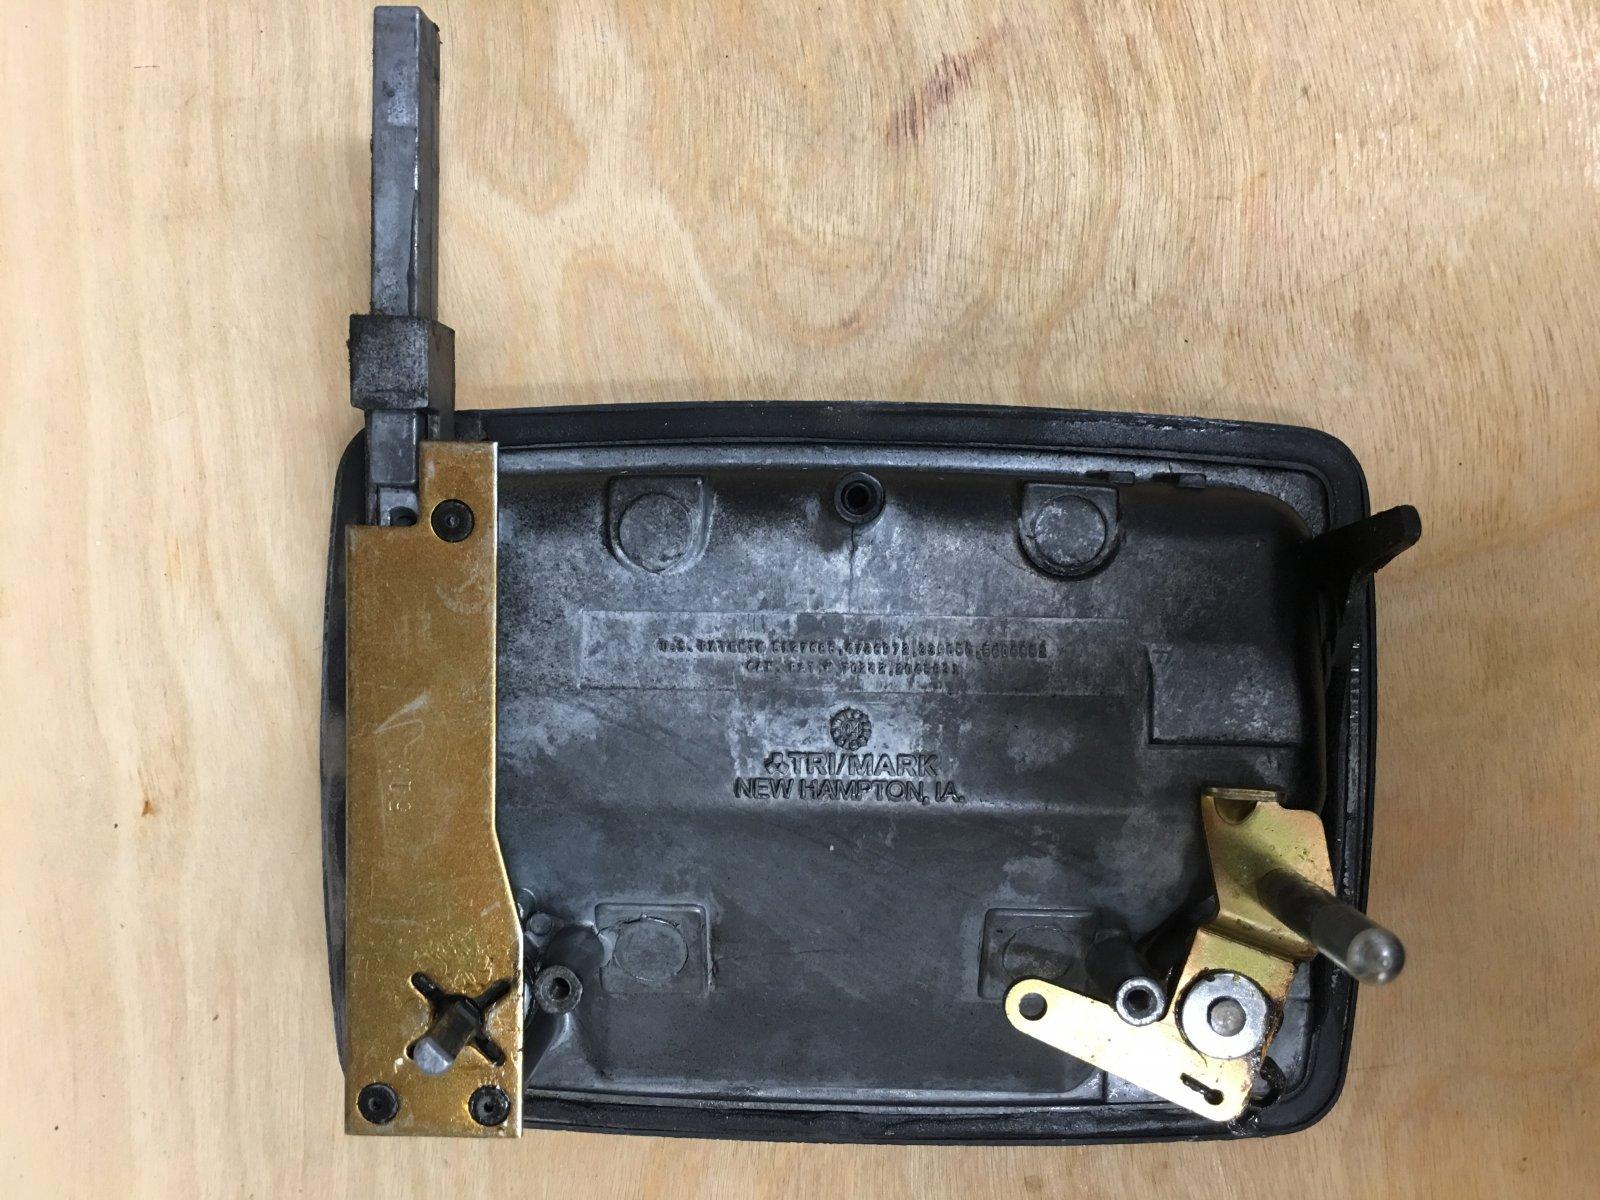 Replaced my TriMark 030-0900 entry door & dead-bolt lock hardware